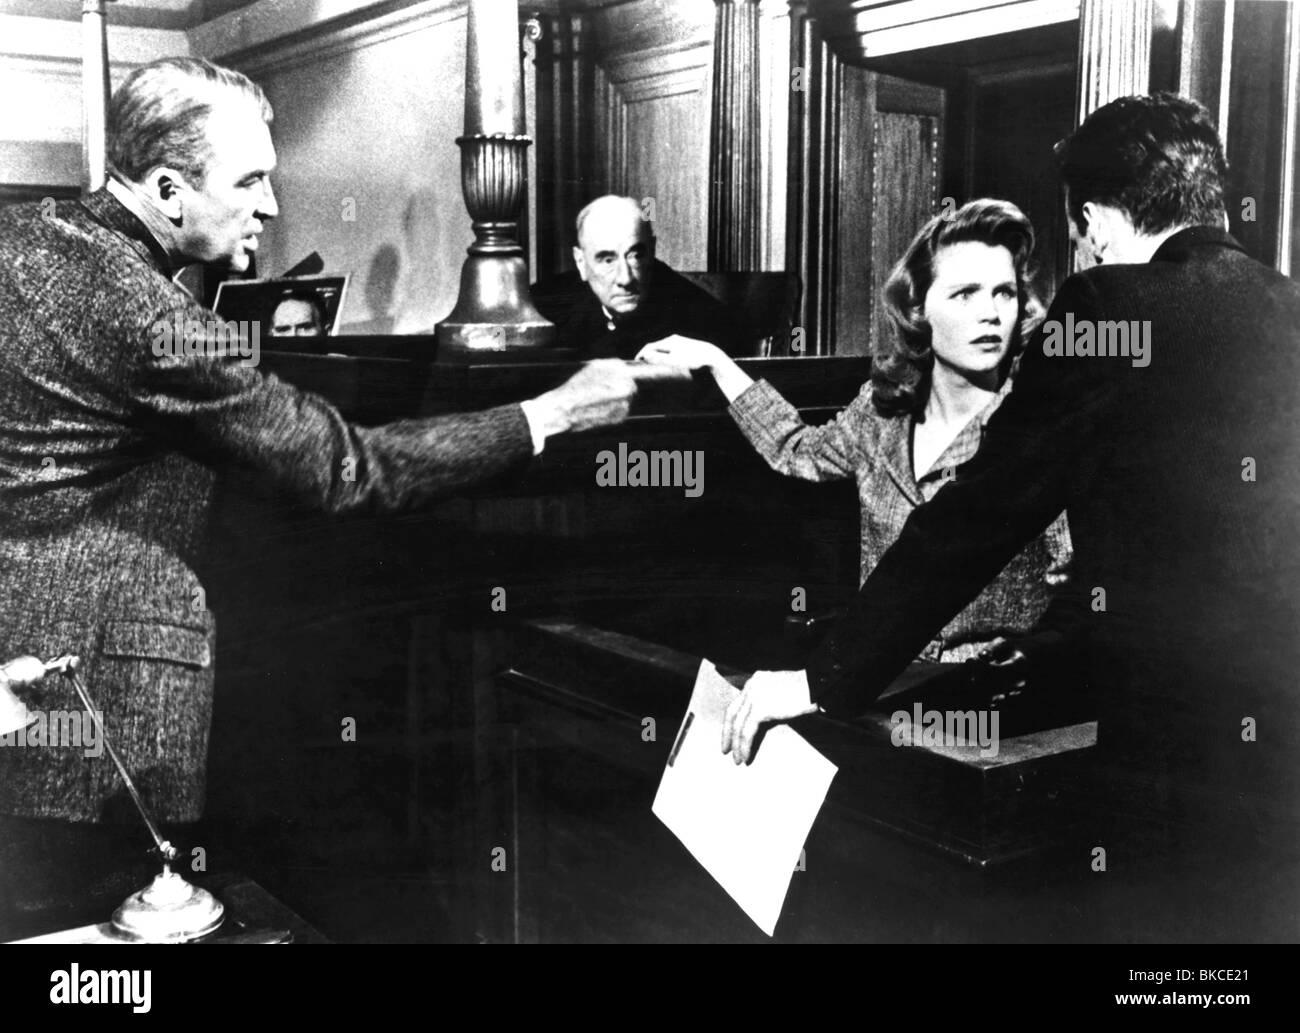 ANATOMY OF A MURDER (1959) JAMES STEWART, LEE REMICK ANMR 004P L ...